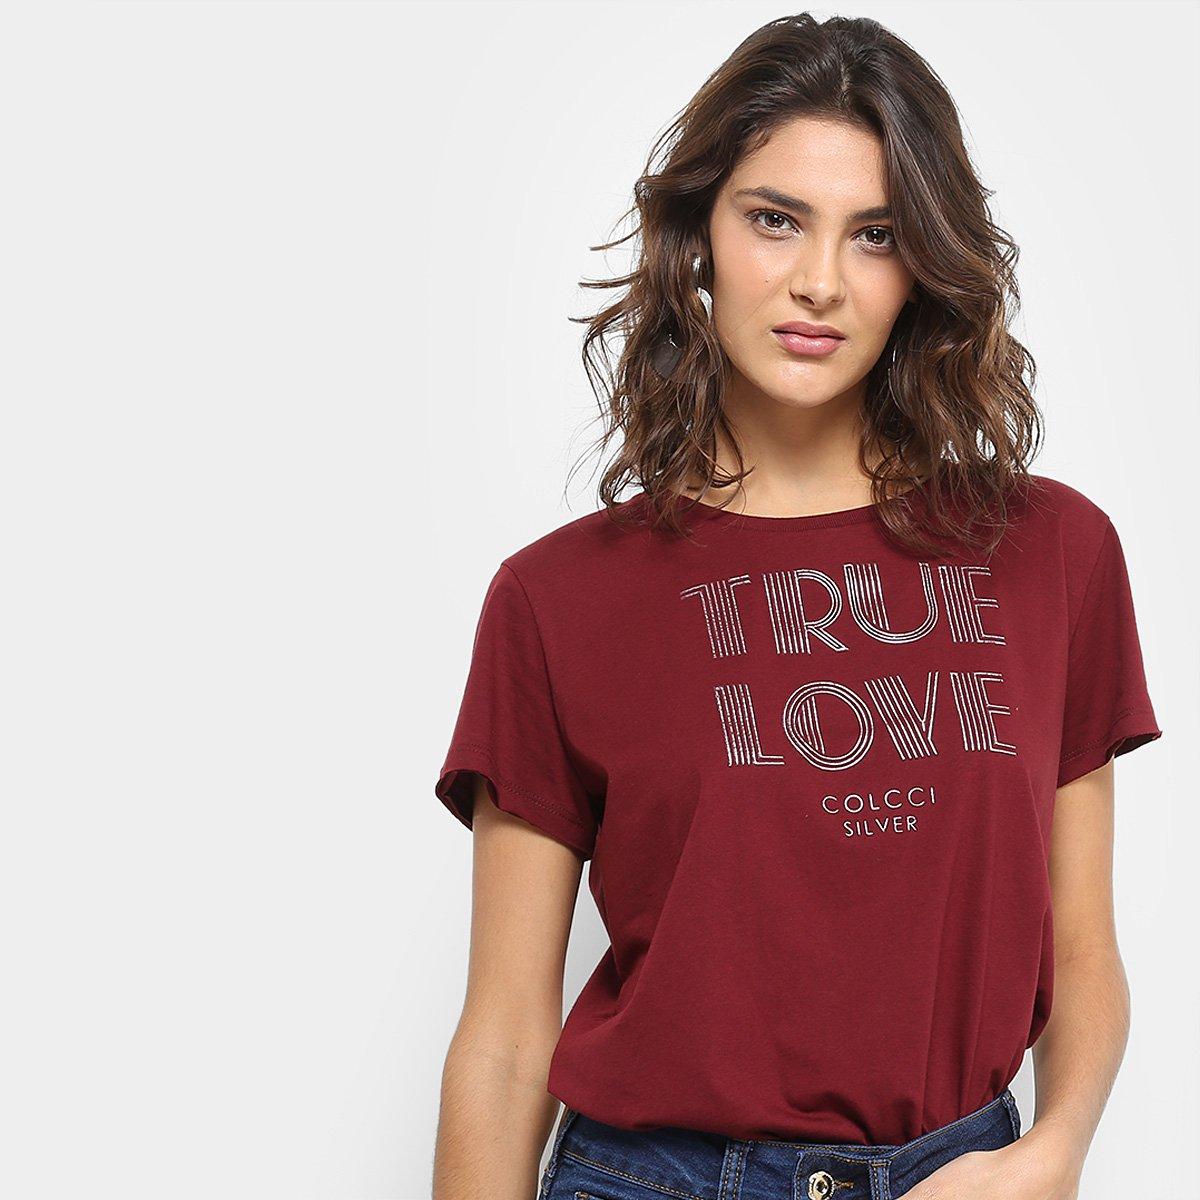 57ee8d189 Camiseta Colcci Estampada True Love Feminina | Zattini